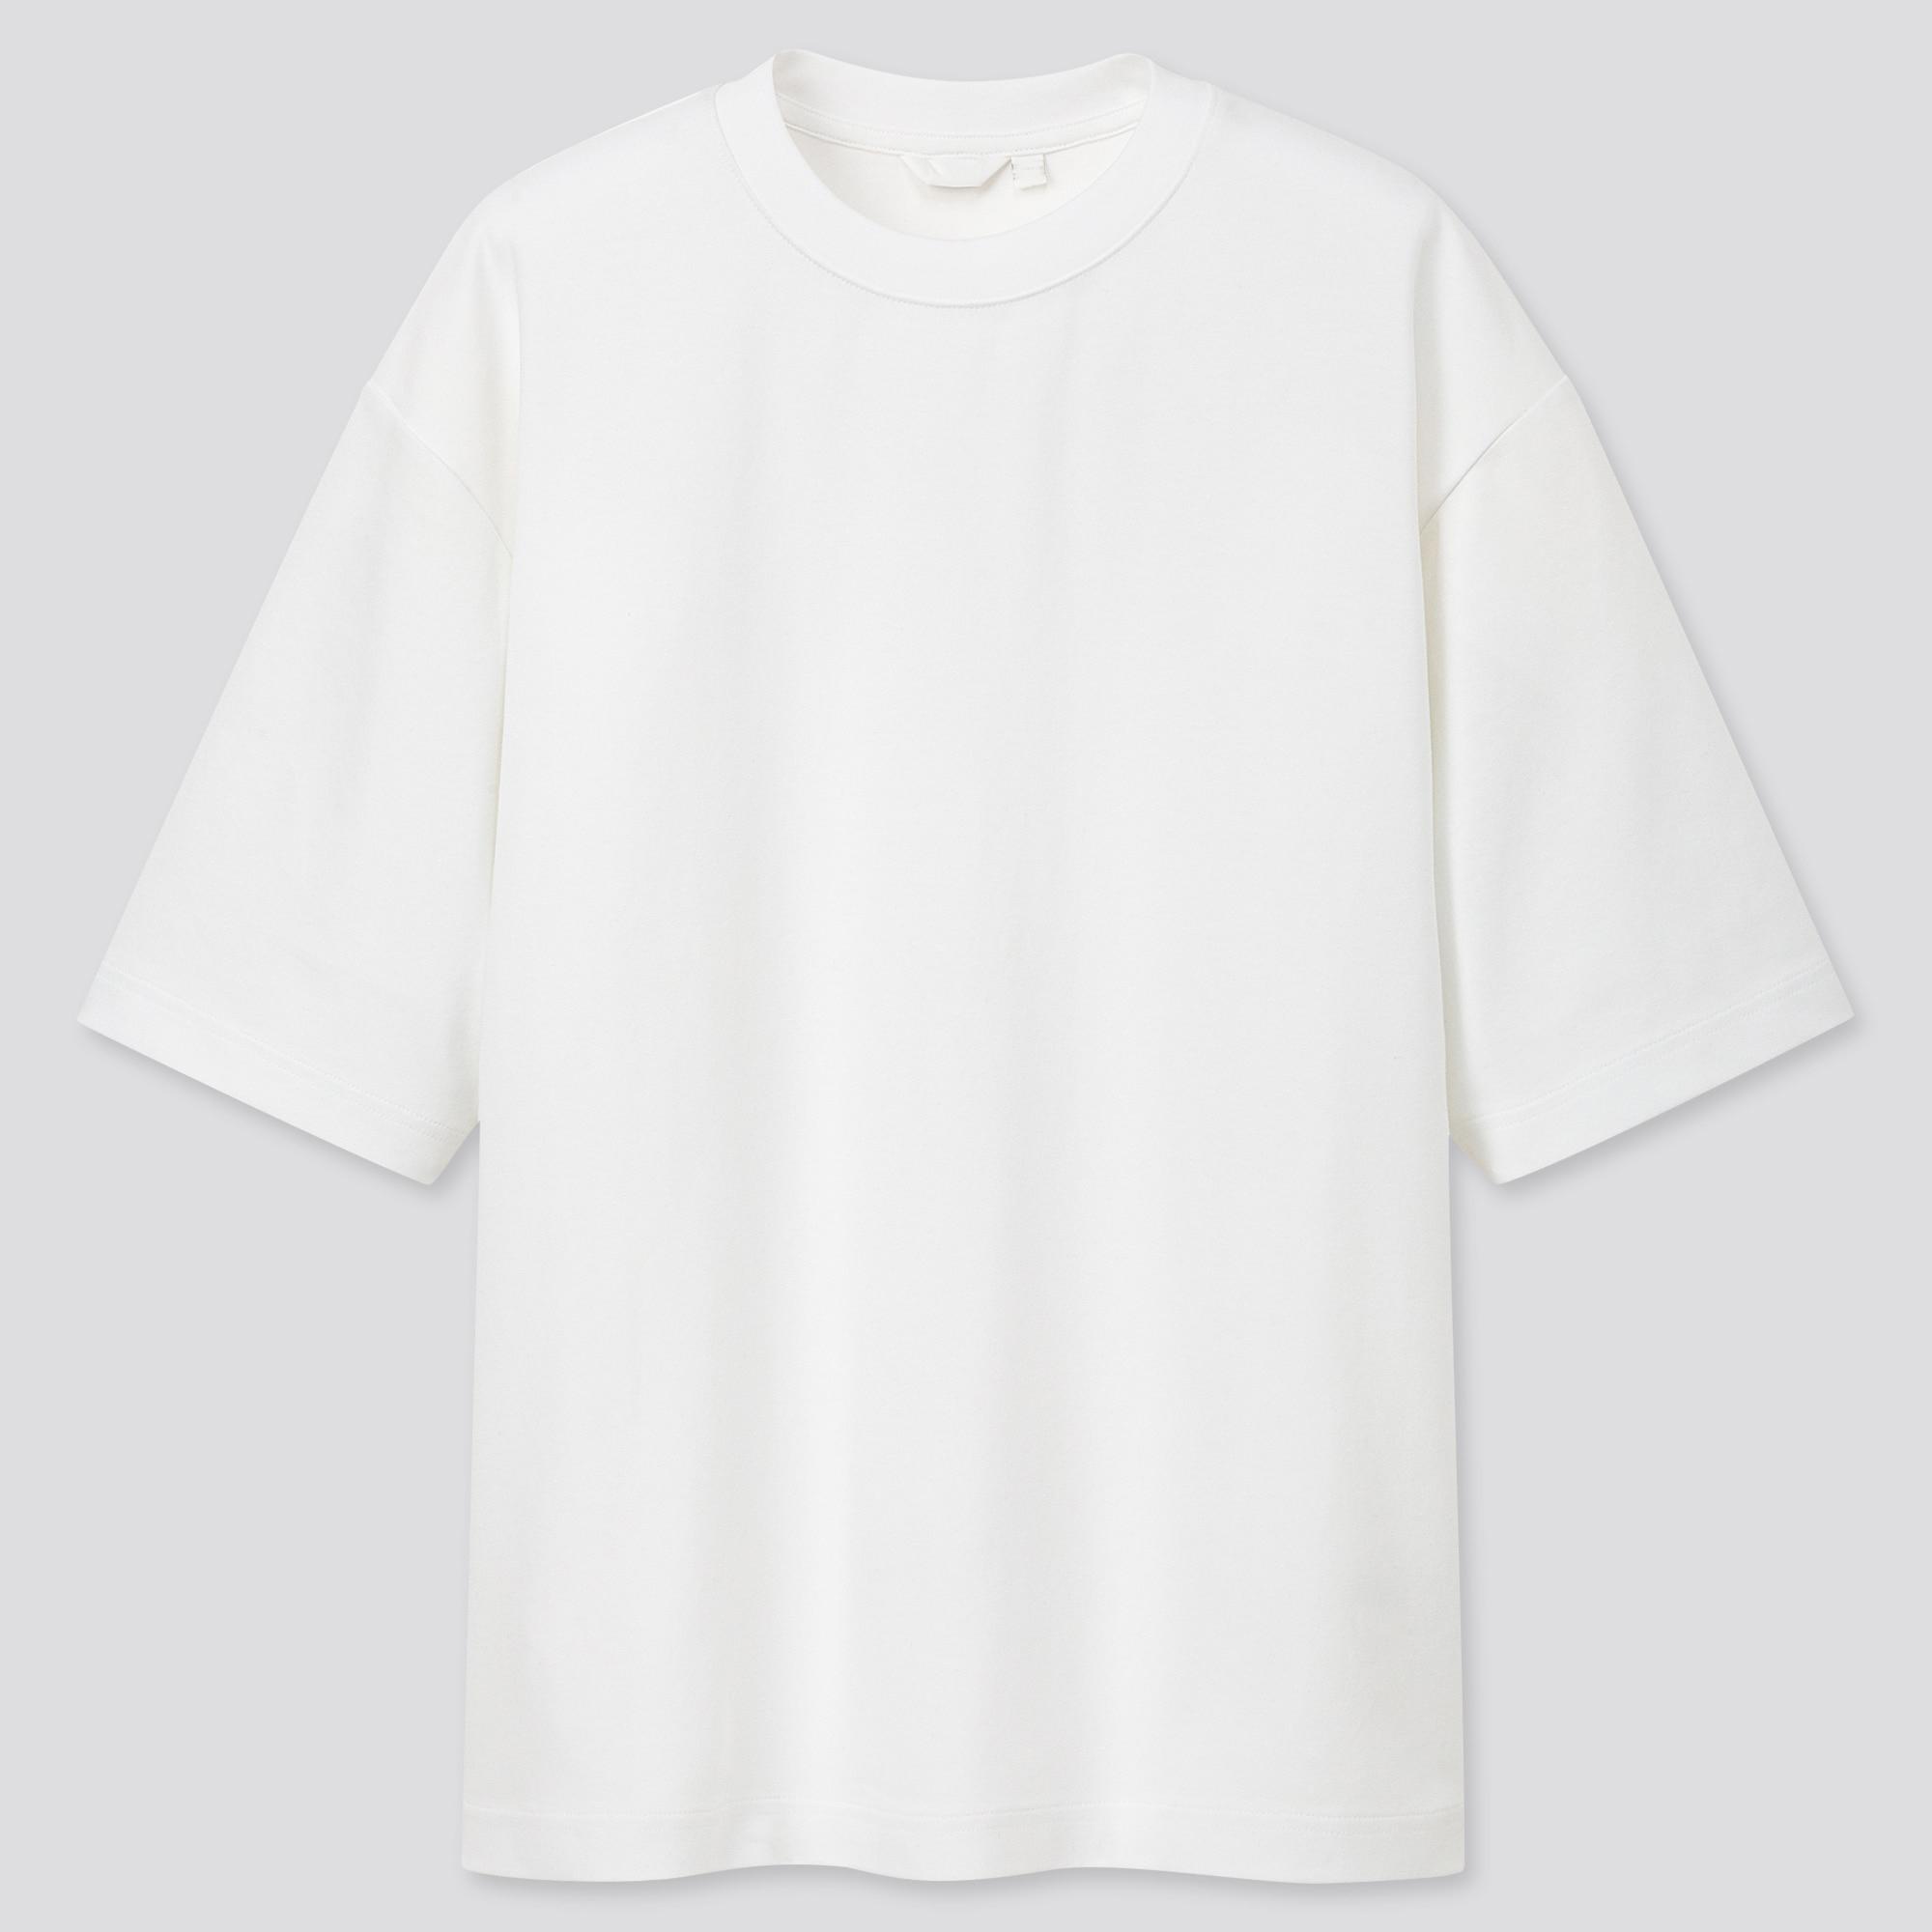 wholesale summer white t shirt/t-shirt, tee shirt men tshirt printing white blank plain oversized custom tshirt 100% cotton